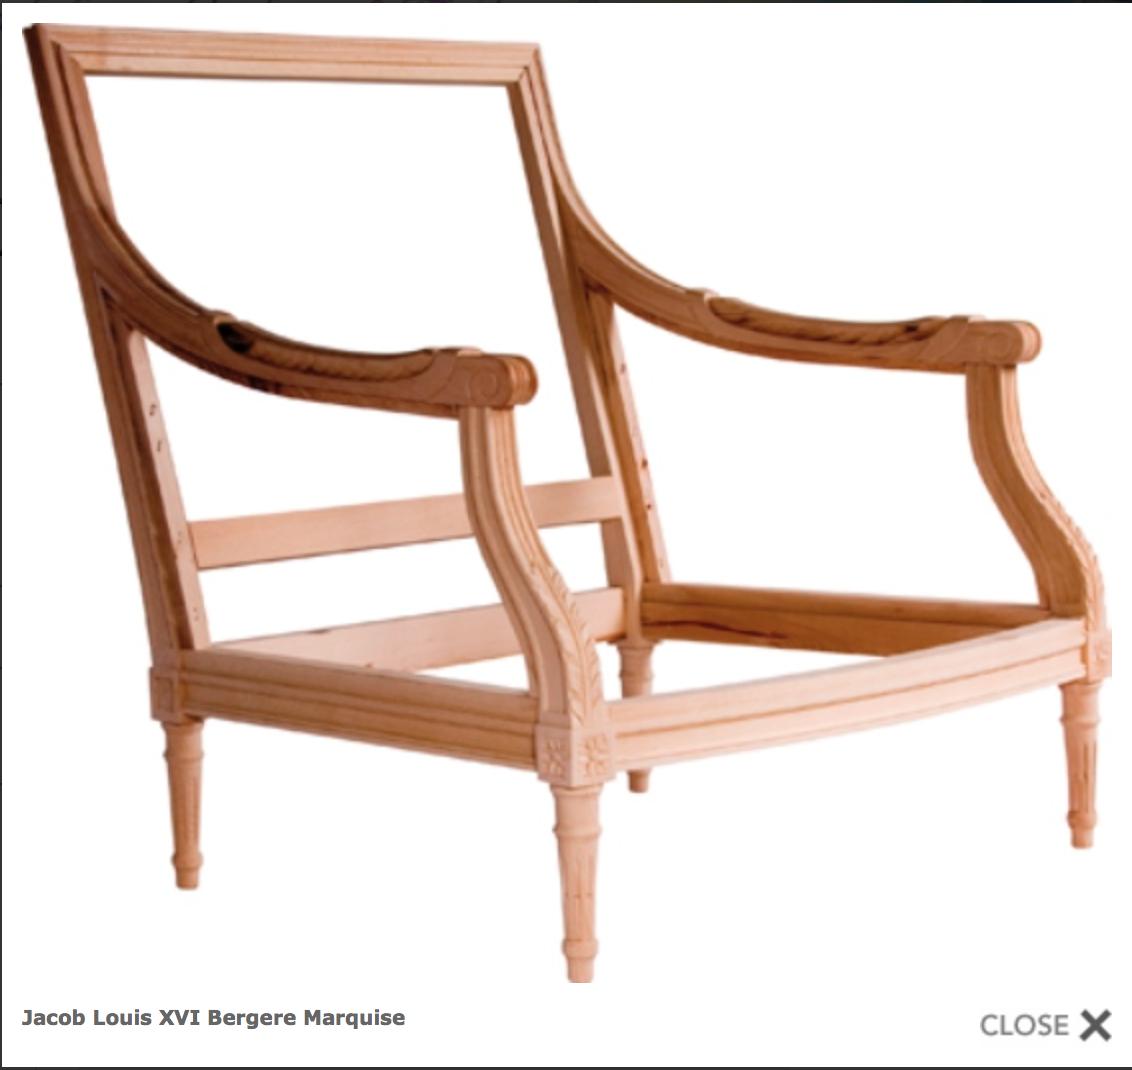 Http Www Meuble Decore Com Jacob Louis Xvi Bergere Marquise Couleurs Et Matieres Us 4 3303 Cfm Occasional Chairs Creative Furniture Bergere Armchair